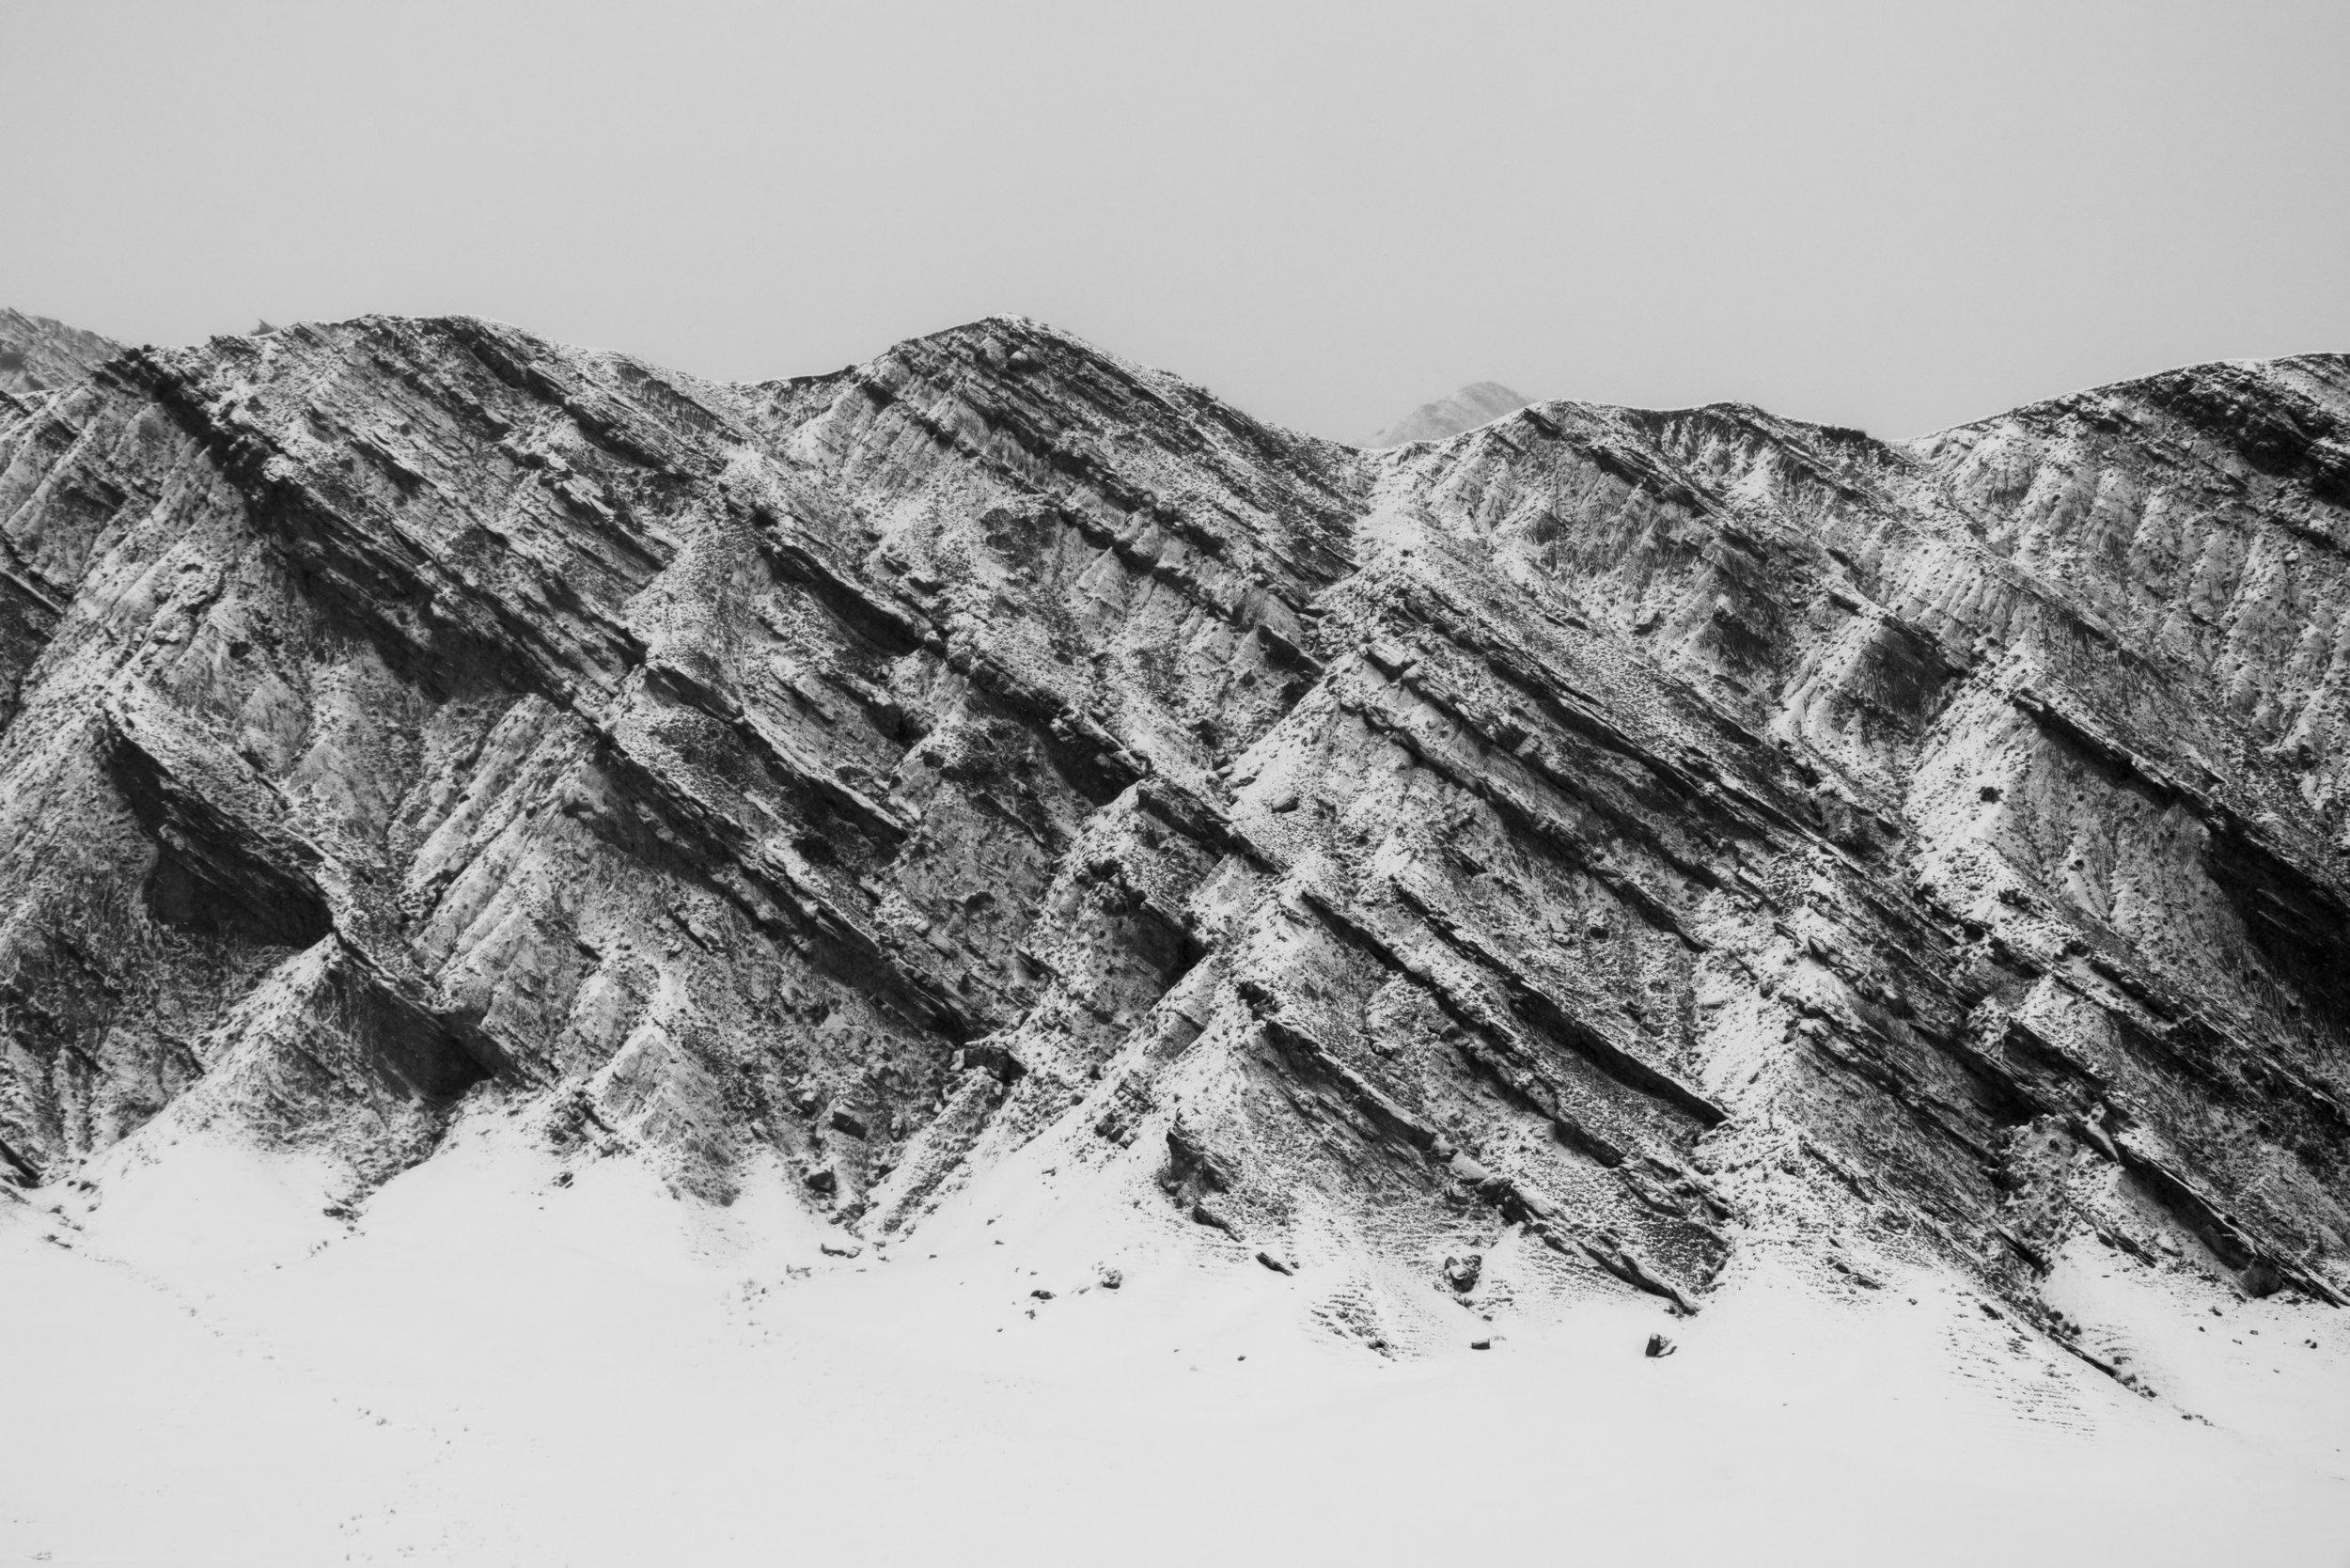 Horse Head #15 - Foto geprint op Fine Art Pearl Baryta (Satin) 285gsm Papier - 40 x 60 cm - 60 x 90 cm - 90 x 135 cm - 135 x 195 cm